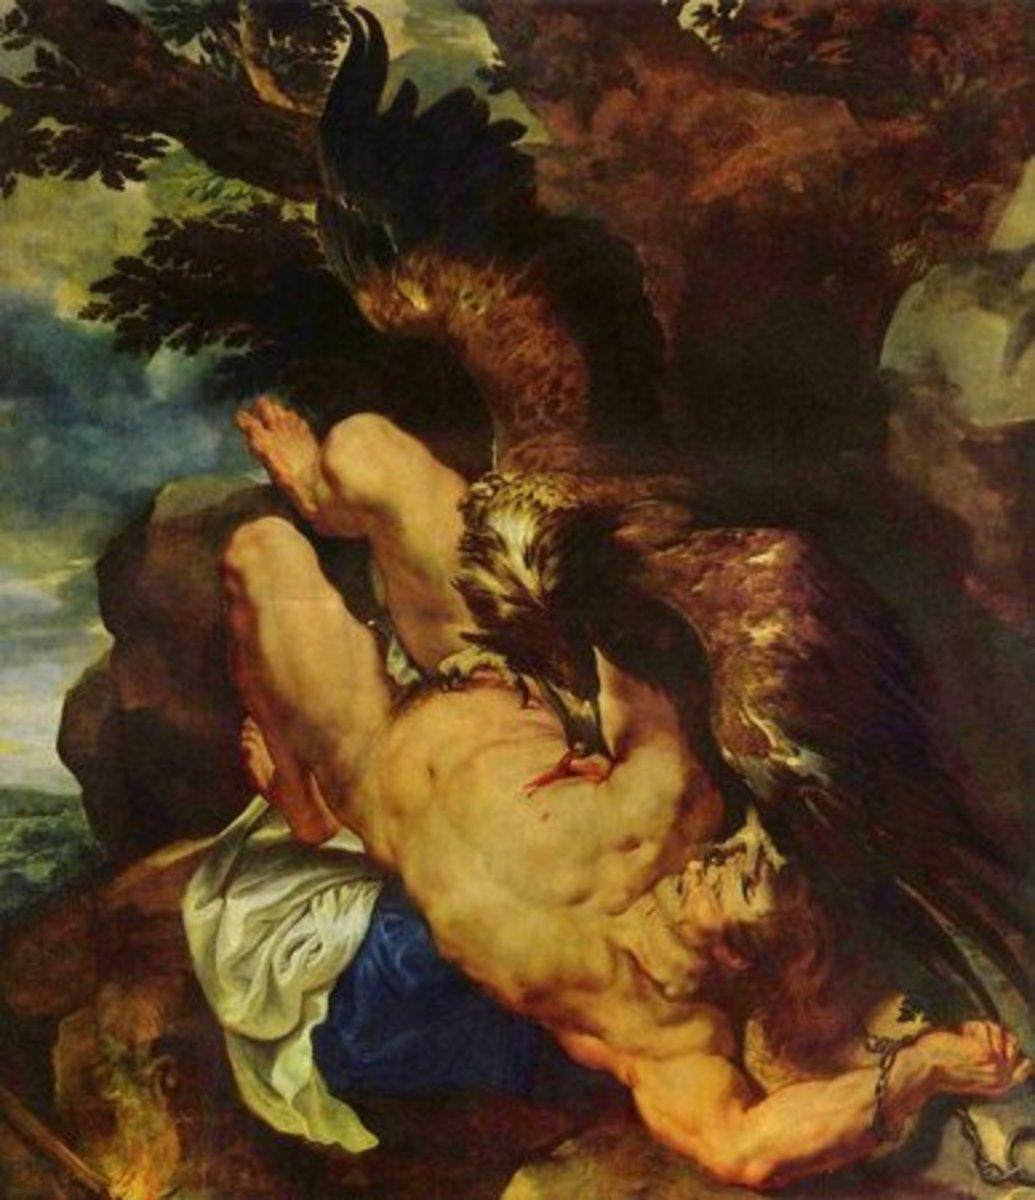 The punishment of Prometheus